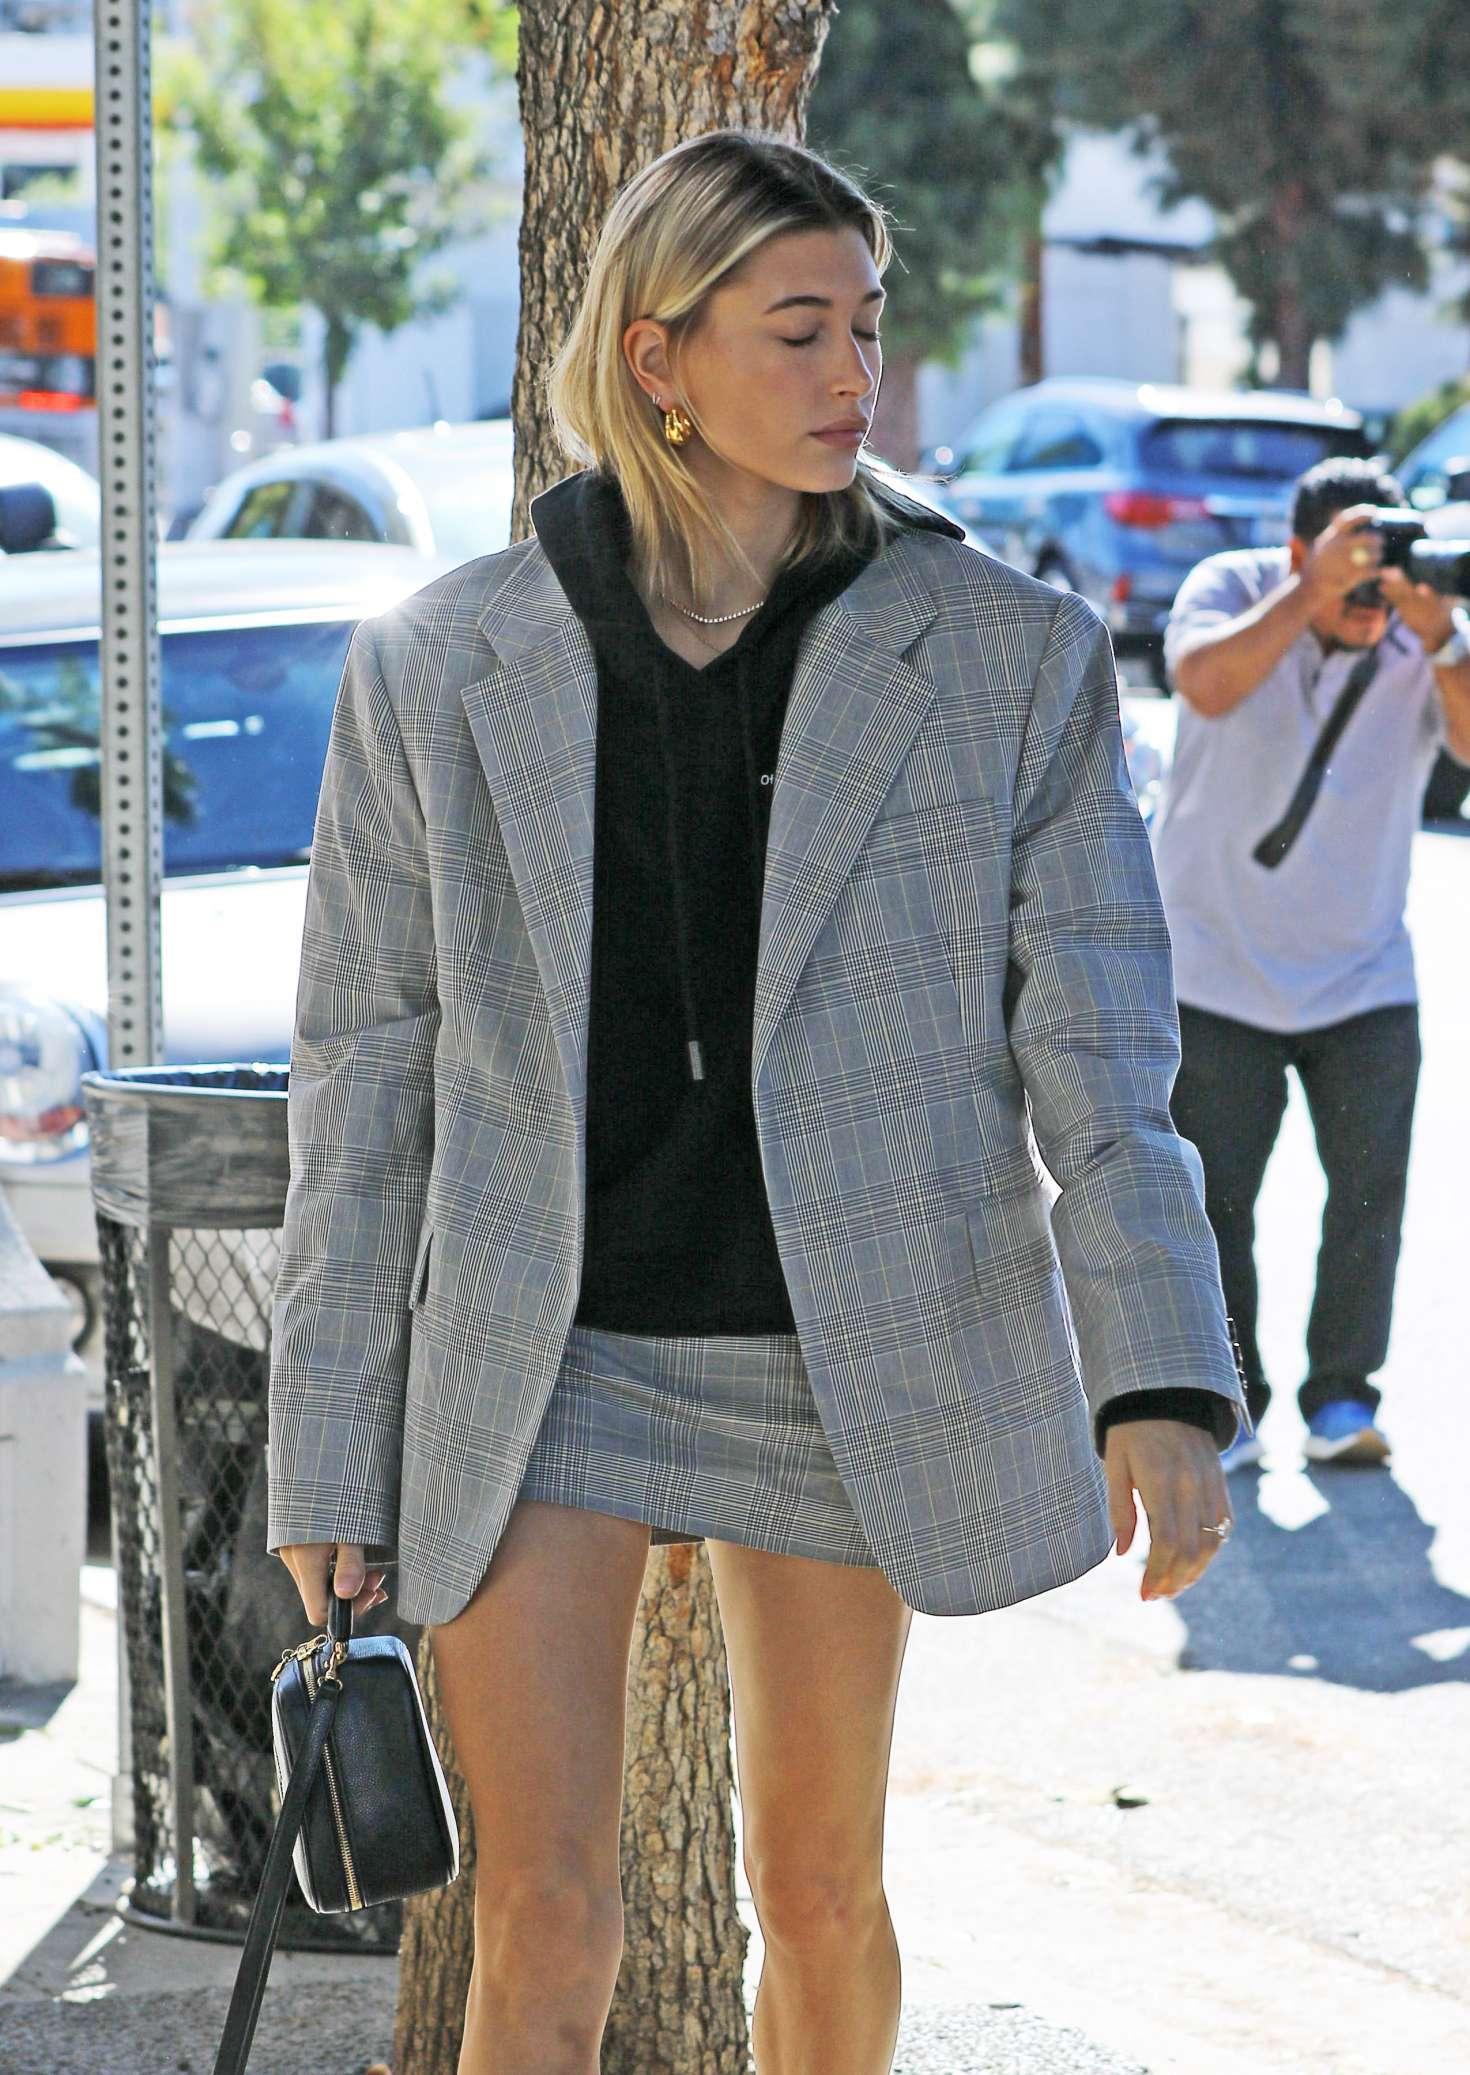 Hailey Baldwin donning a grey close fitting matching pencil skirt